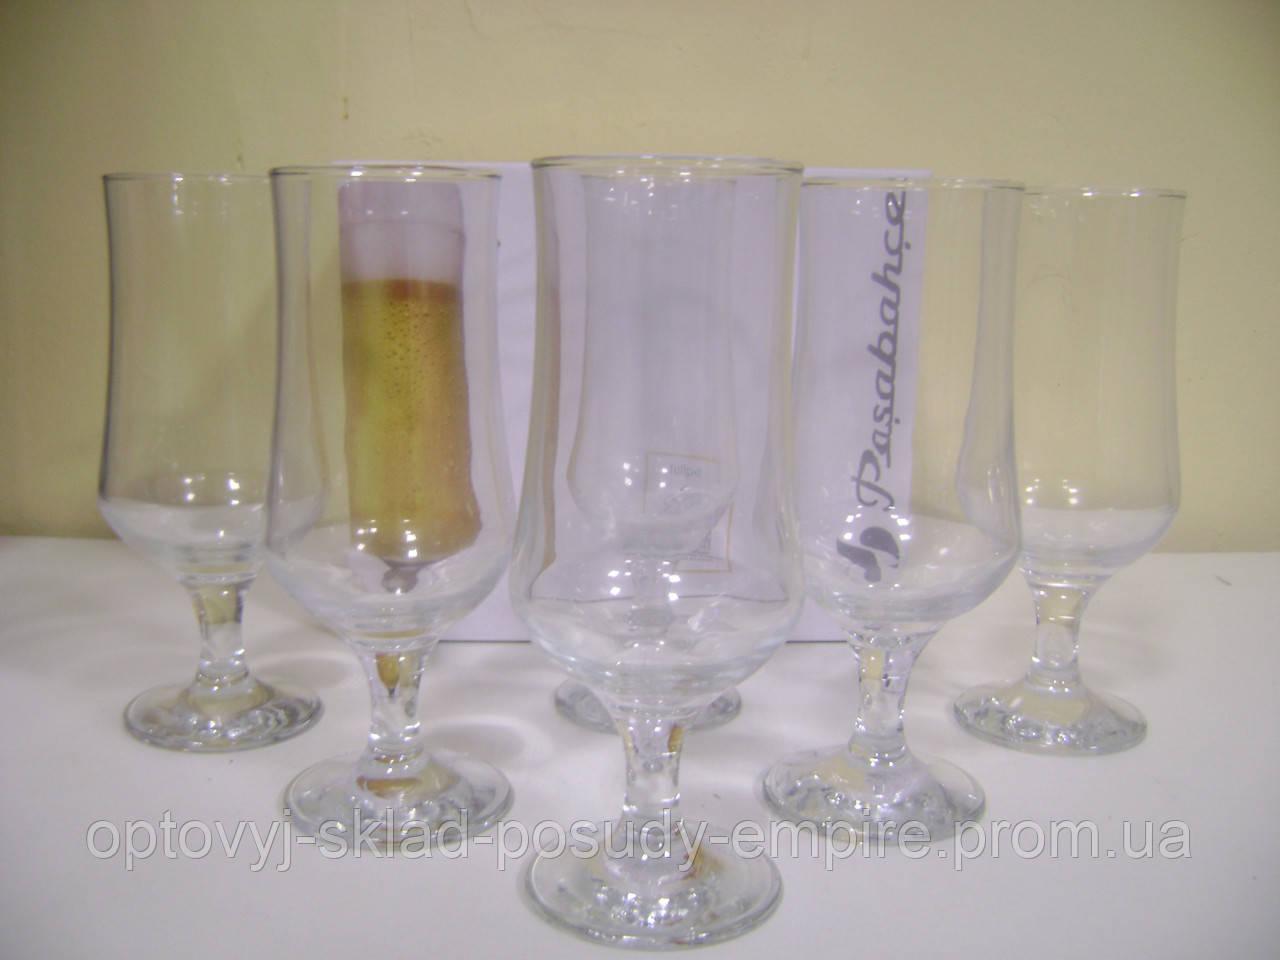 Тулип бокал для пива 370гр. 1/6 шт. Pasabahce 44169